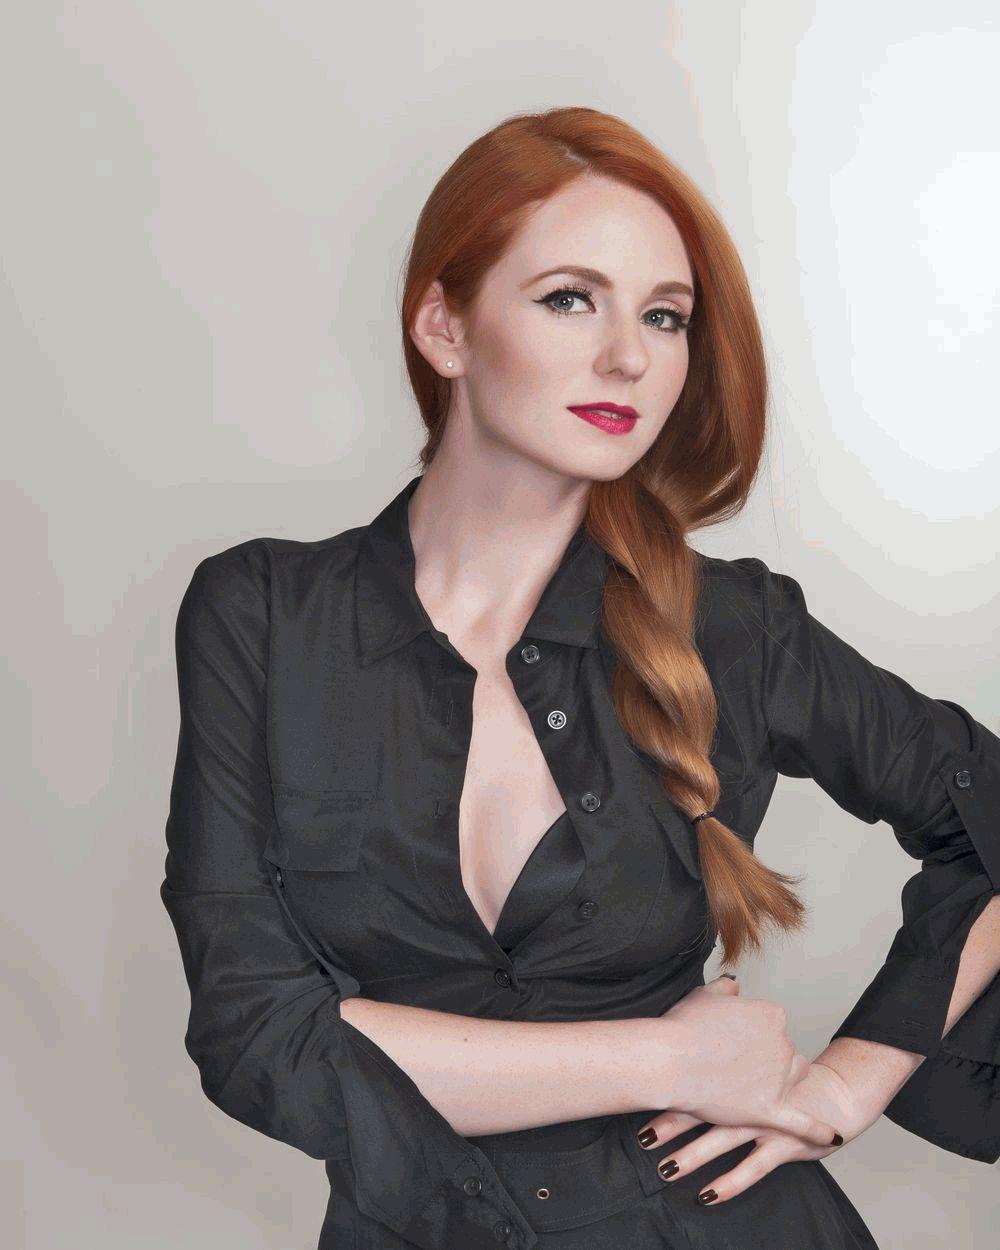 Лена Катина новое